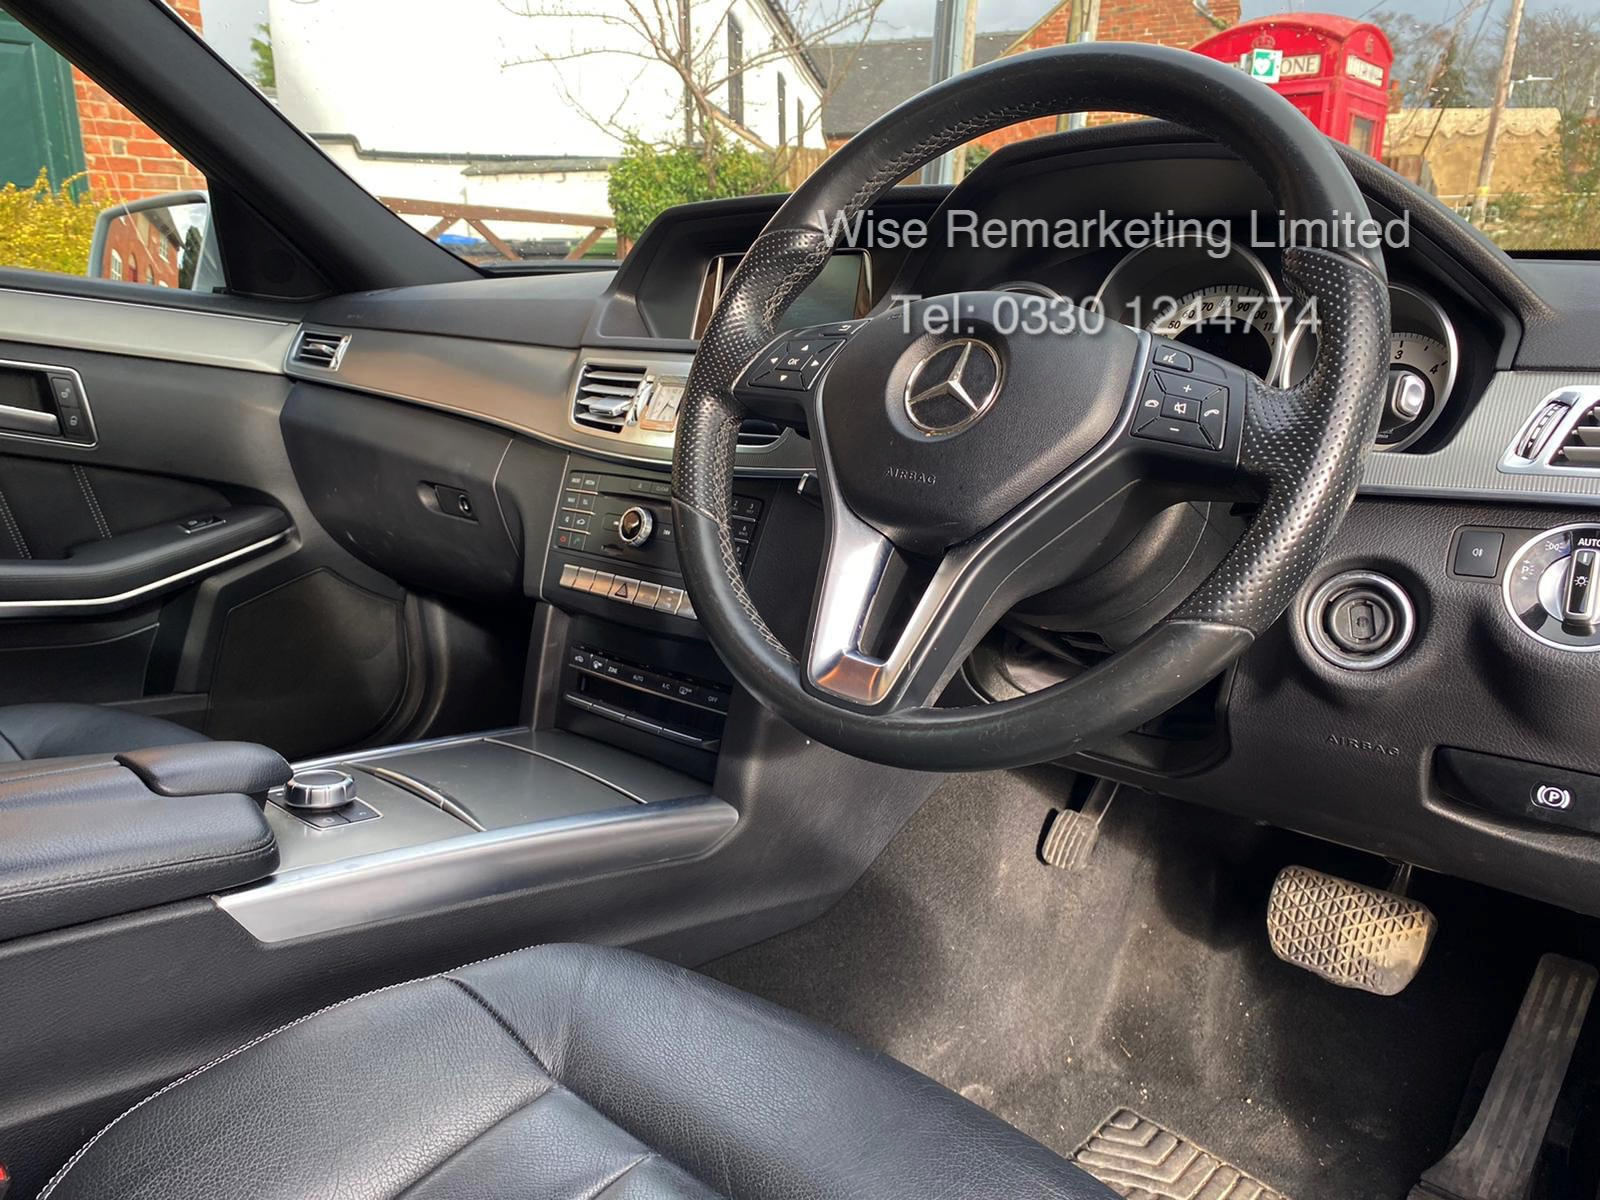 Mercedes E220d 2.1 Special Equipment Auto 2015 15 Reg - 1 Former Keeper - Sat Nav - Parking Sensors - Image 6 of 14